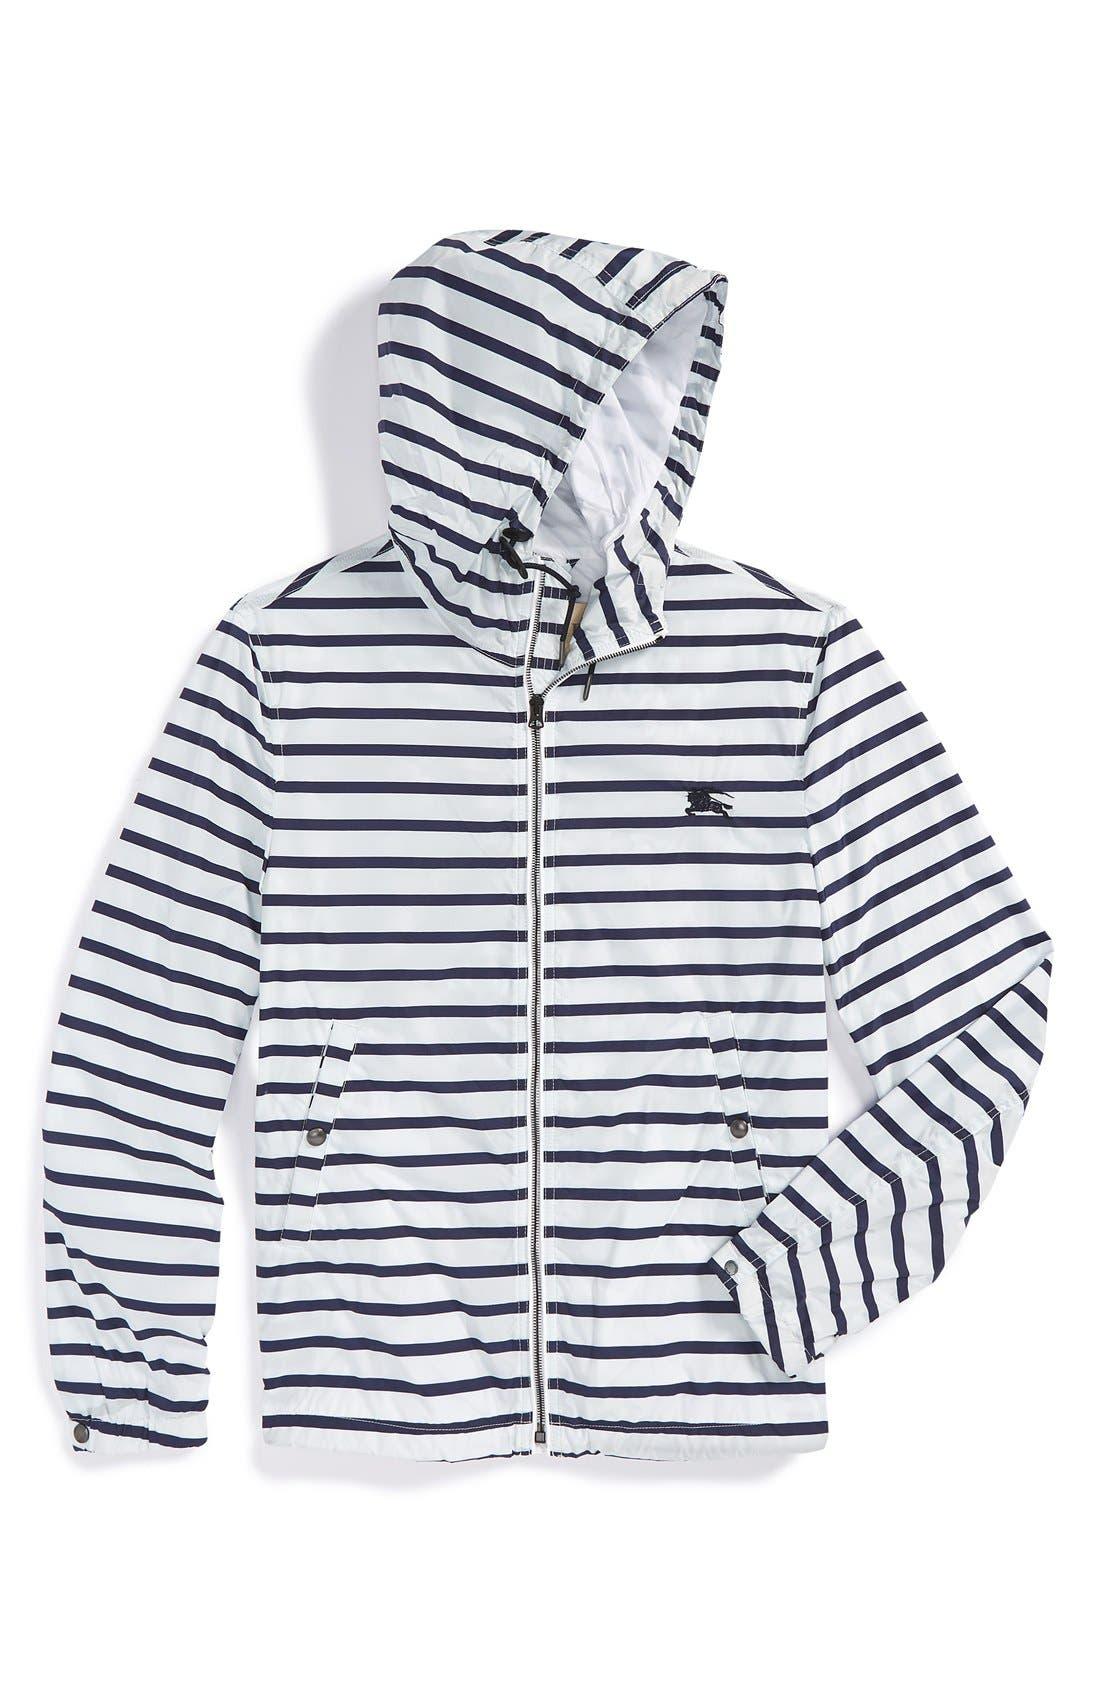 BURBERRY,                             Brit 'Kelson' Stripe Jacket,                             Alternate thumbnail 2, color,                             100